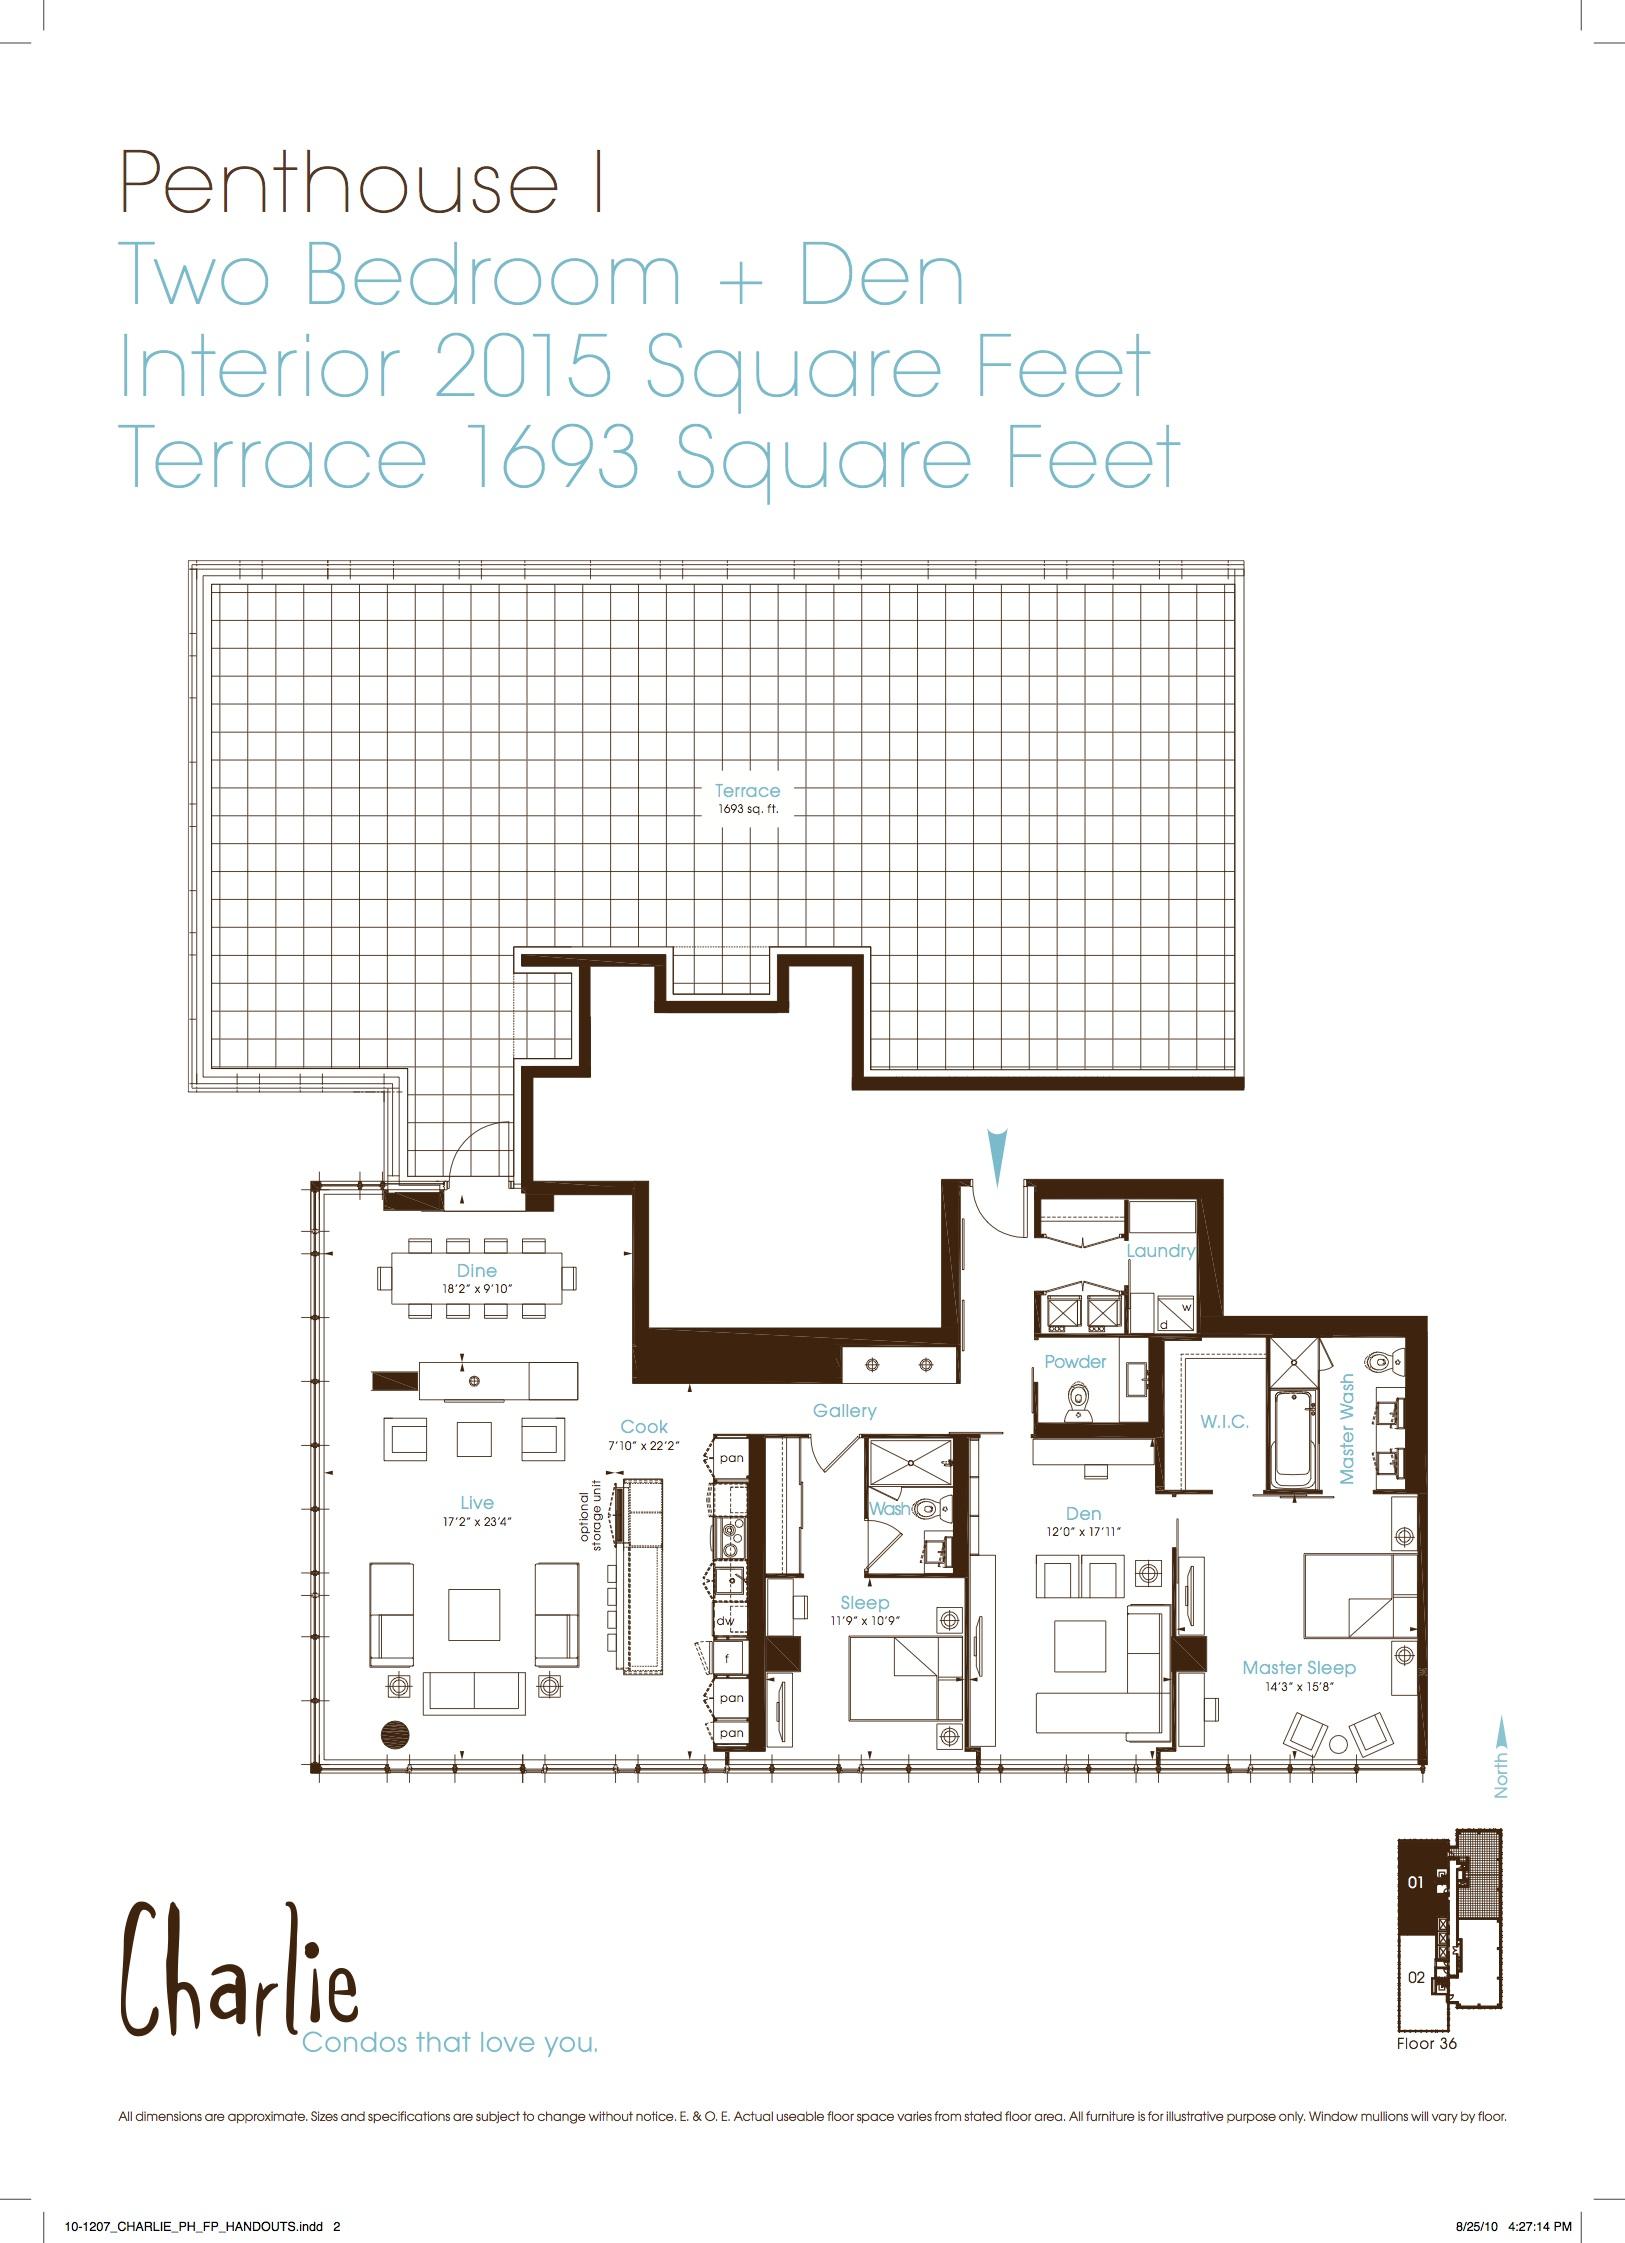 Charlie Condos 8 Charlotte Street Luxury Condos For Sale Floor Plans